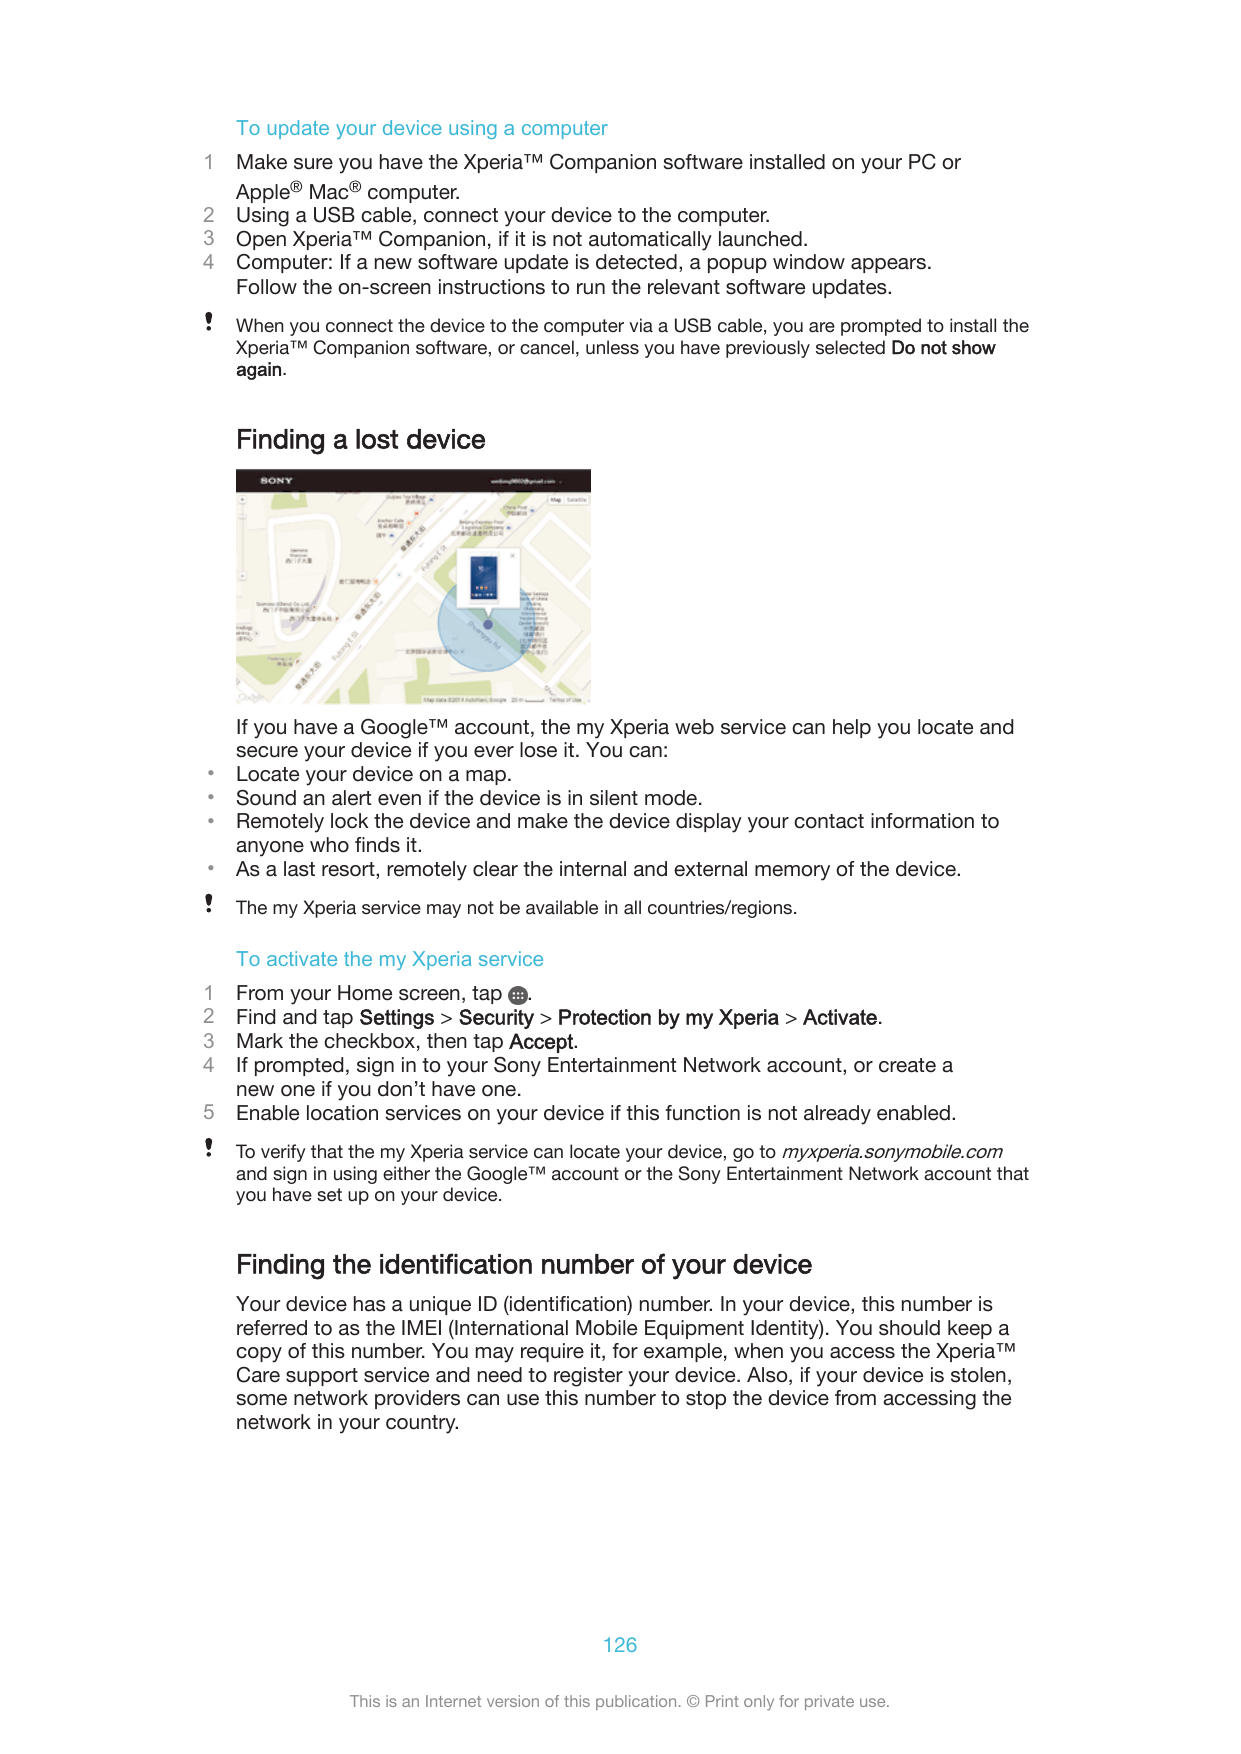 Manual - Sony Xperia M2 Aqua - Android 5 1 - Smart Guides